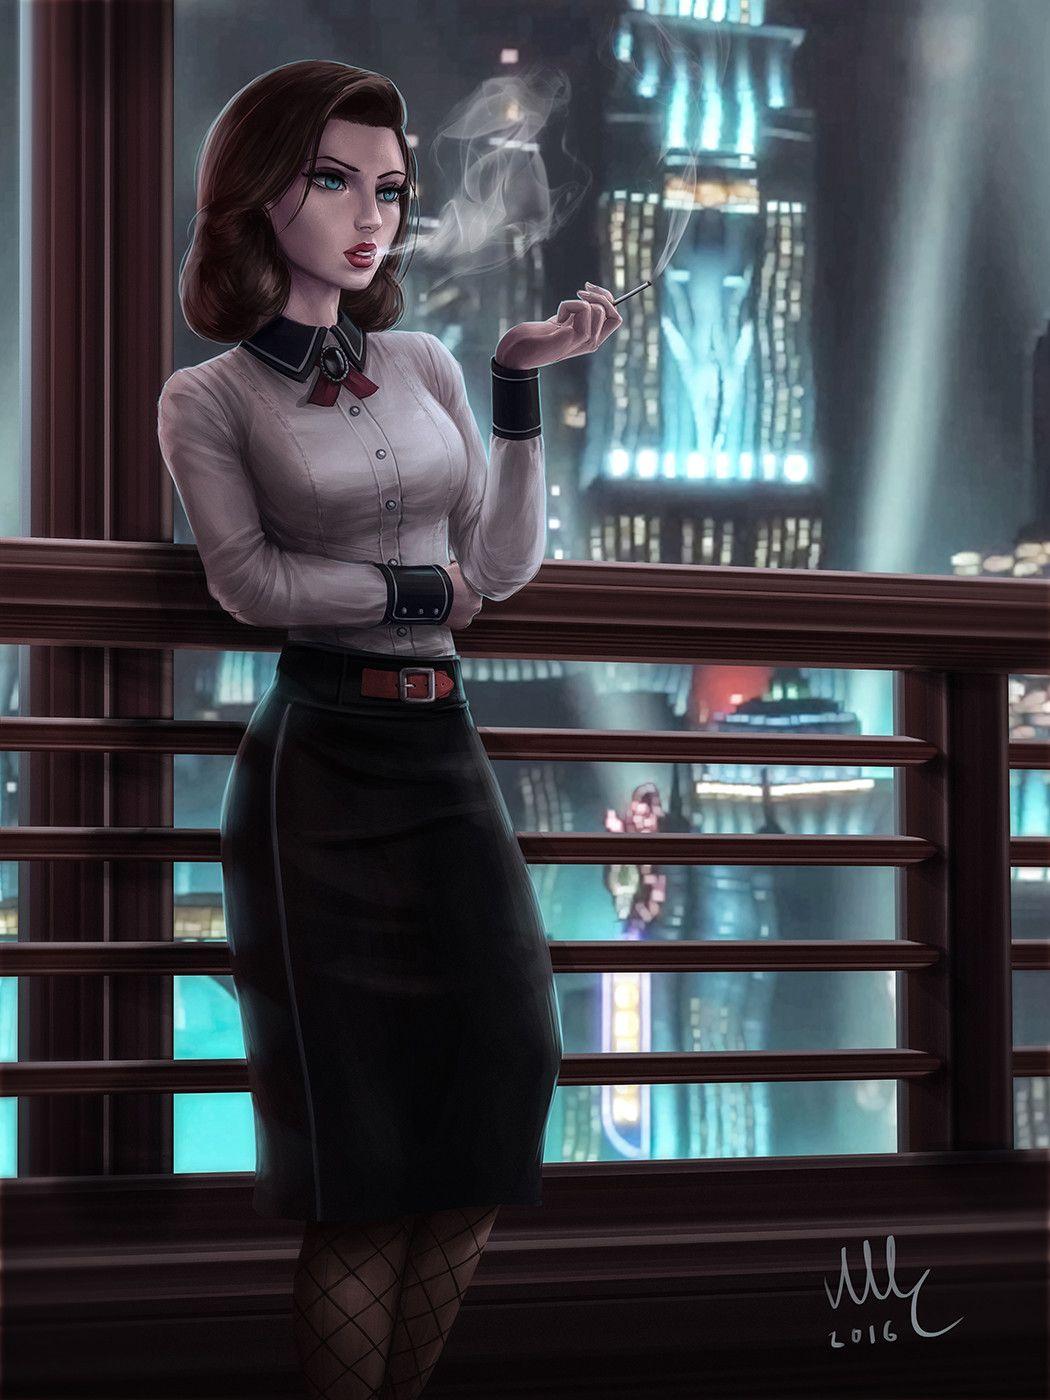 bioshock elizabeth pics game characters https pinterest com